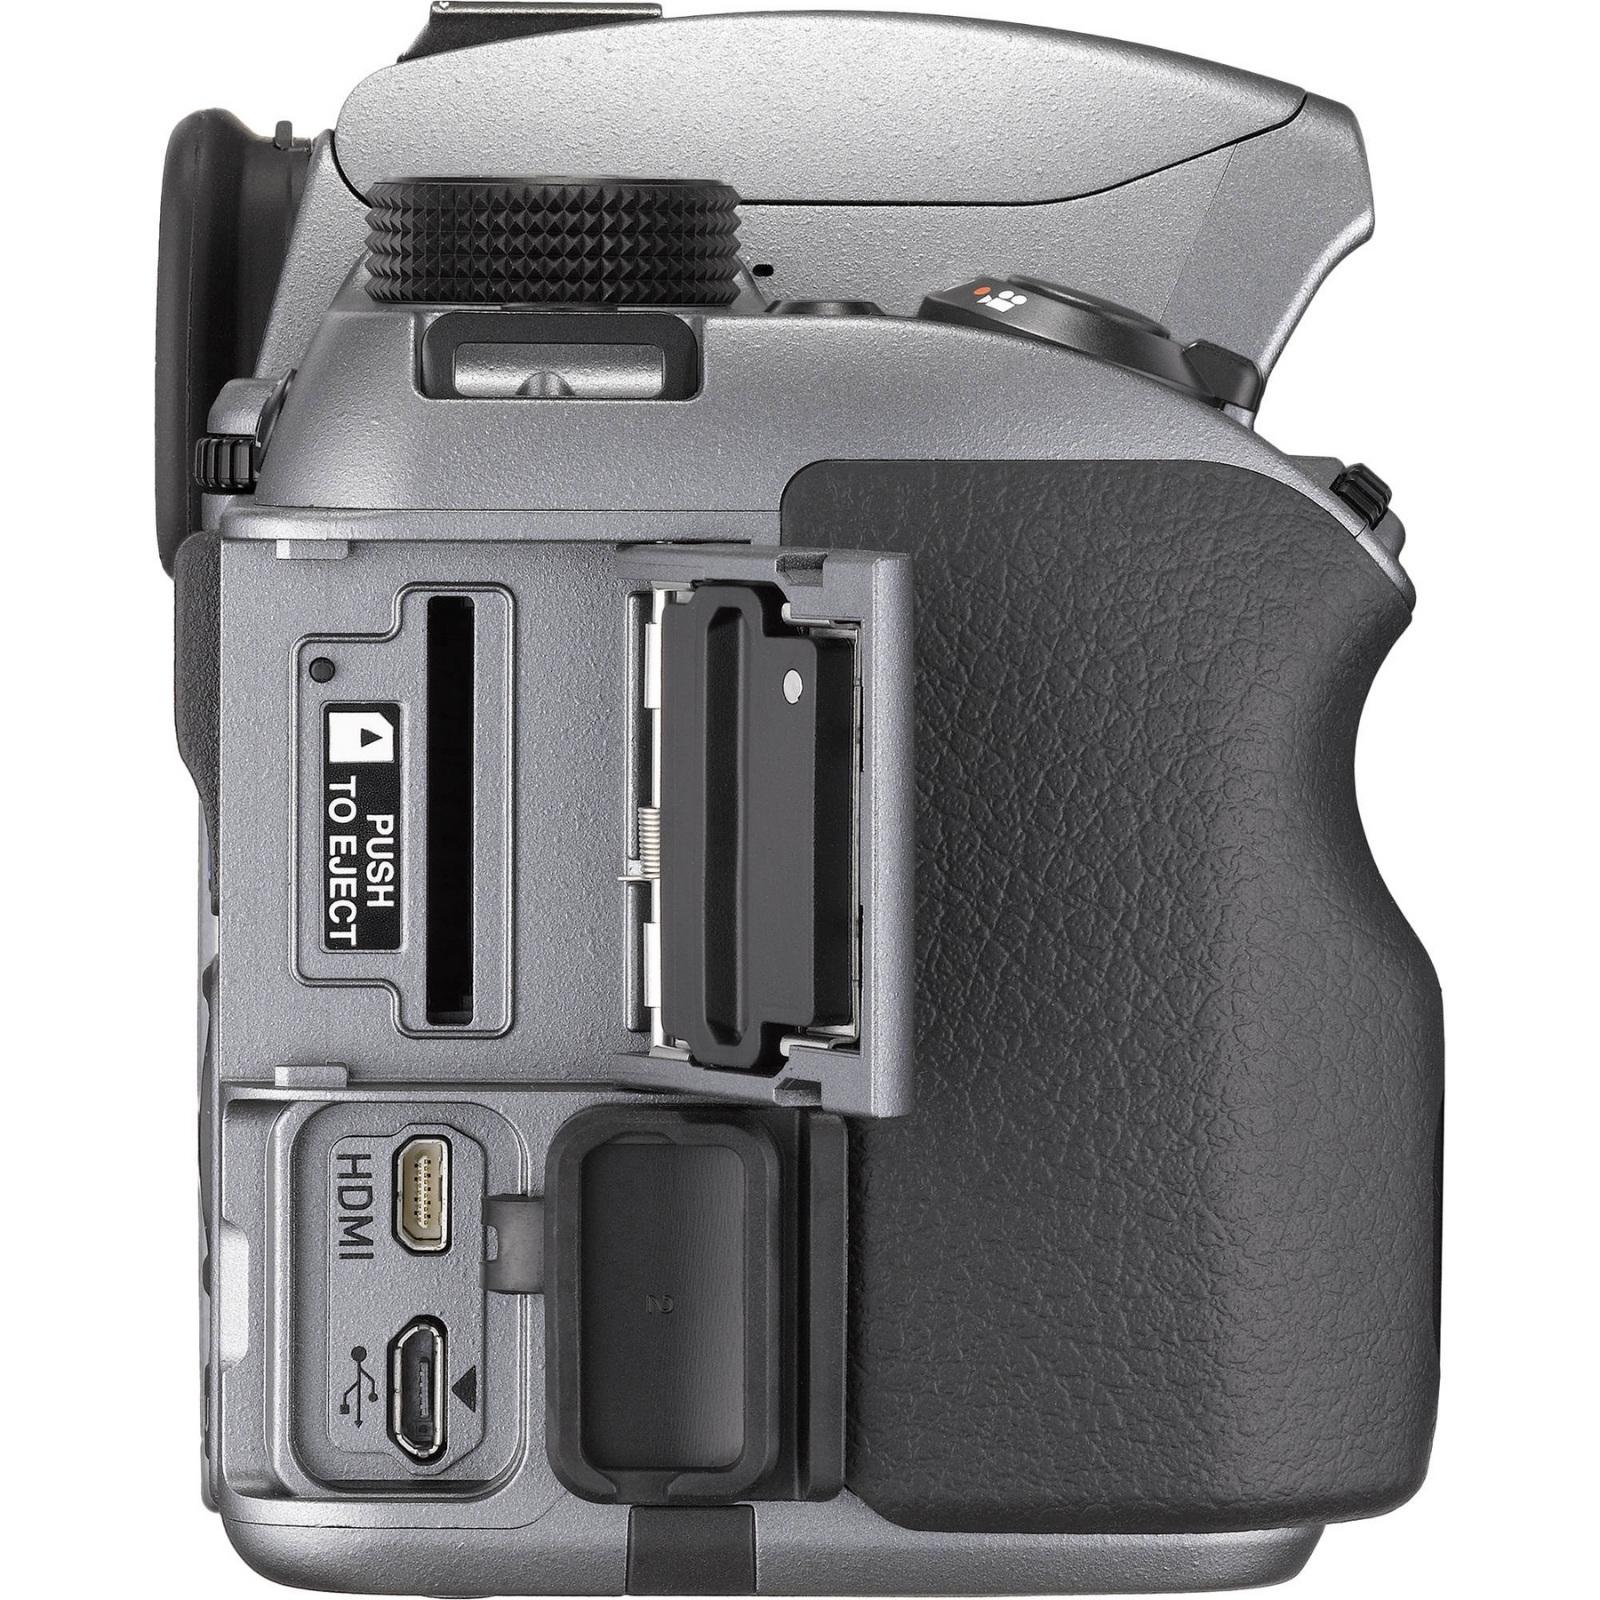 PENTAX ペンタックス デジタル一眼レフカメラ K-70 ボディ シルキーシルバー 新品